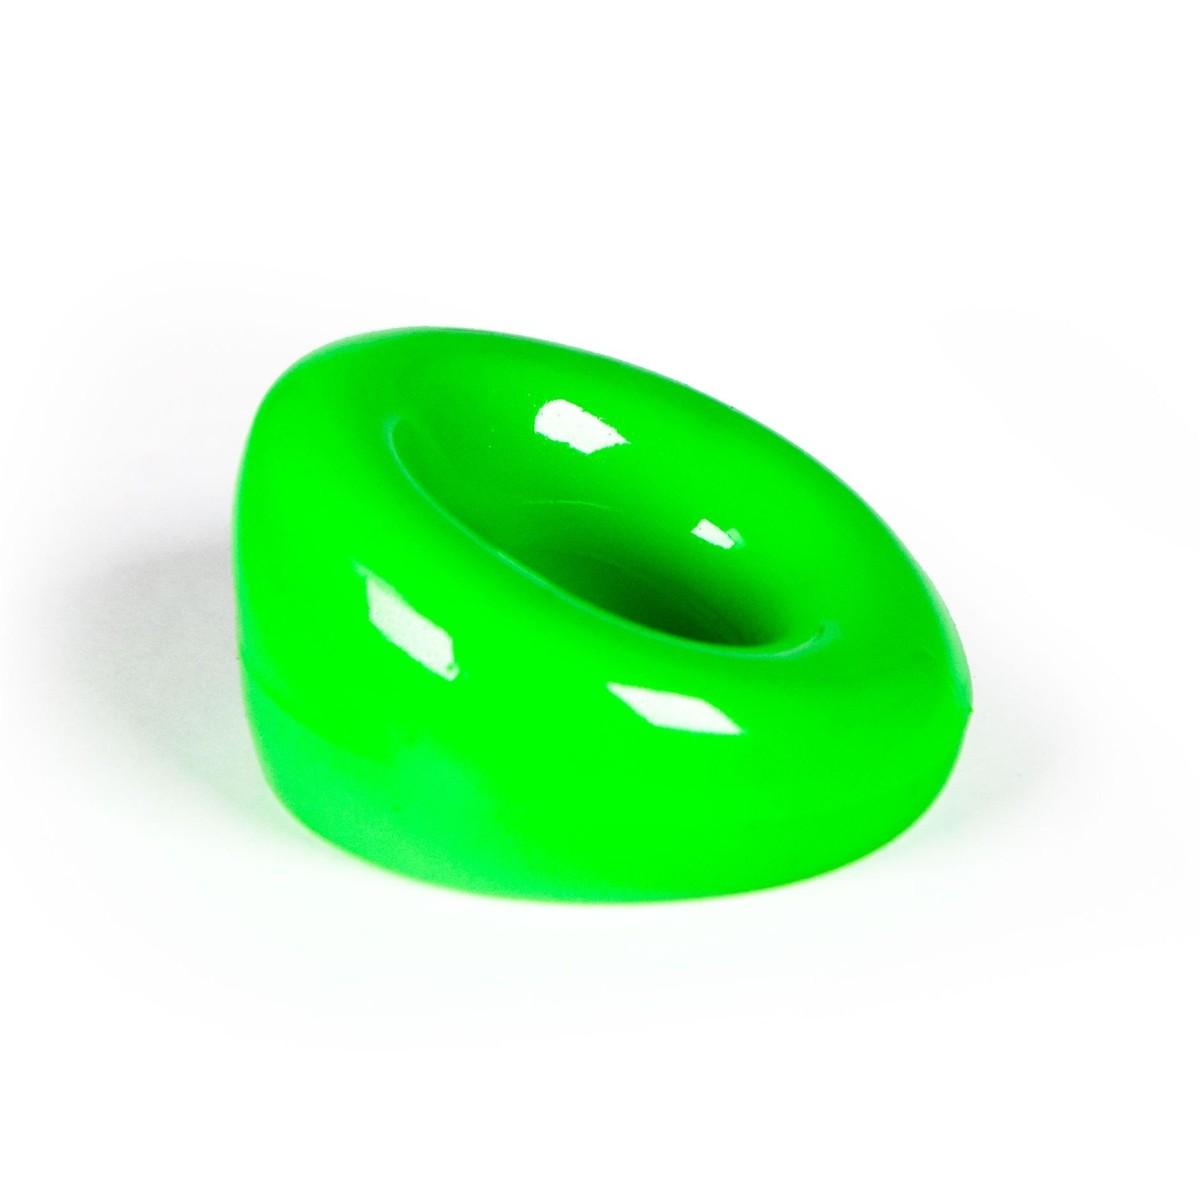 Zizi Powerstroke Cock Ring Fluo Green